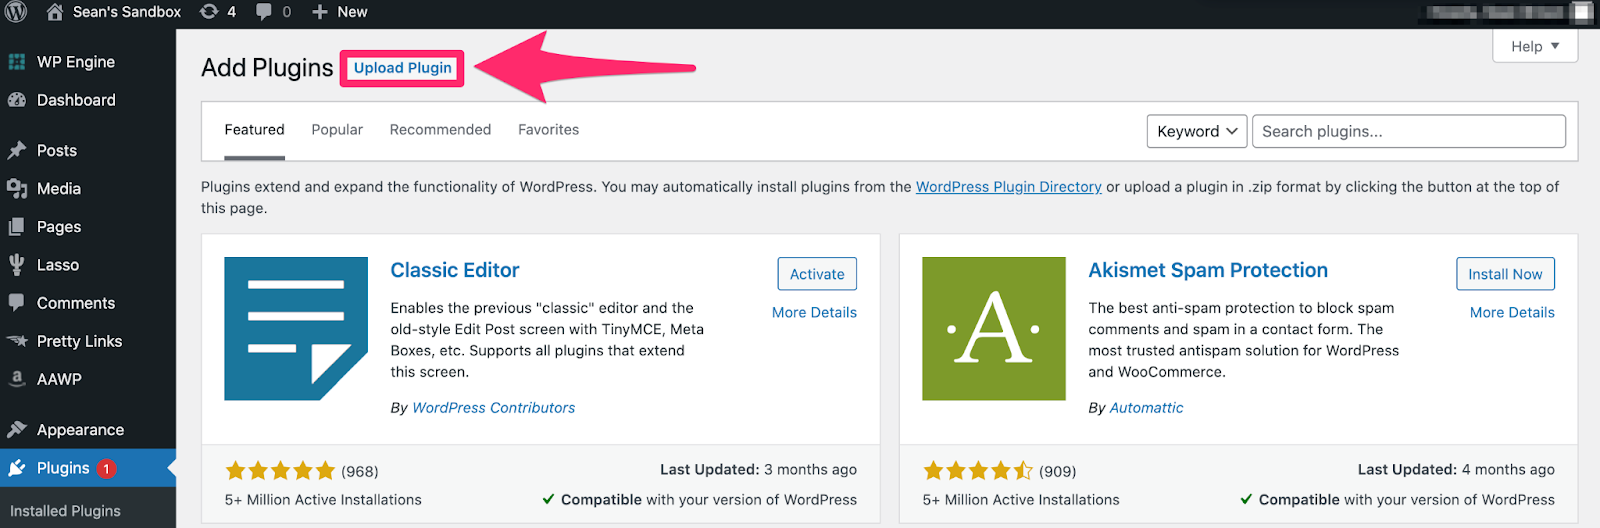 uploading aawp plugin inside wordpress